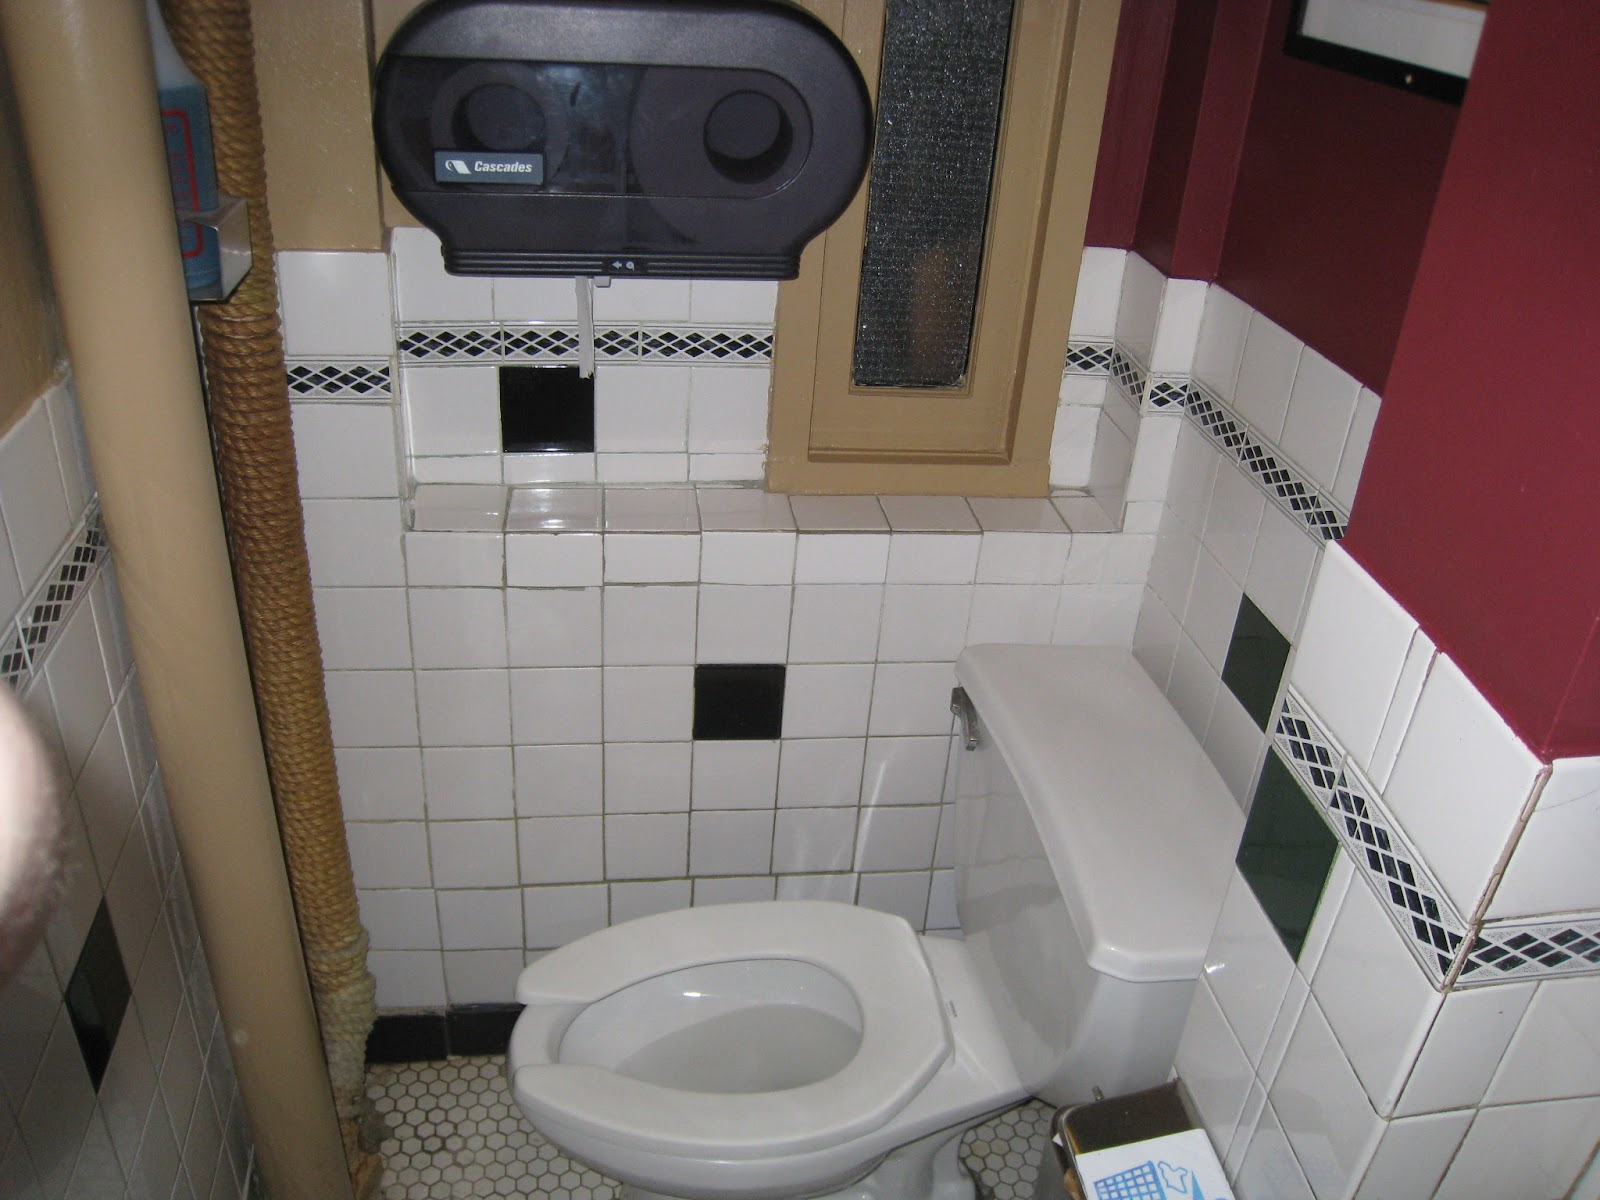 Ac e xpression bathroom design fail for Bathroom design fails